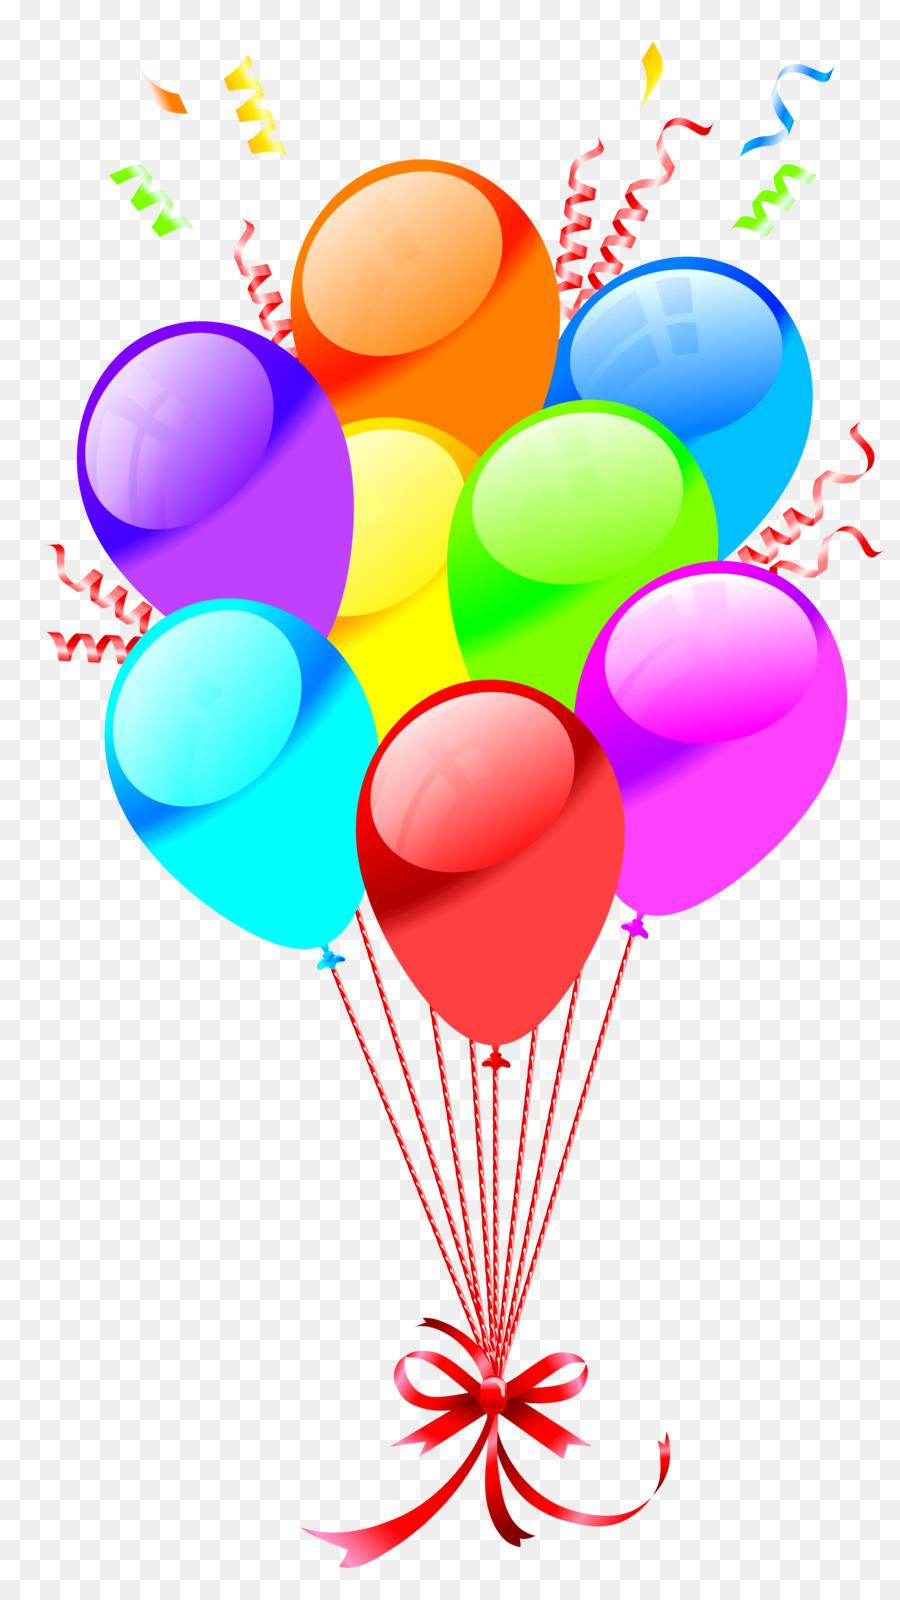 Clipart balloon happy birthday. Balloons party